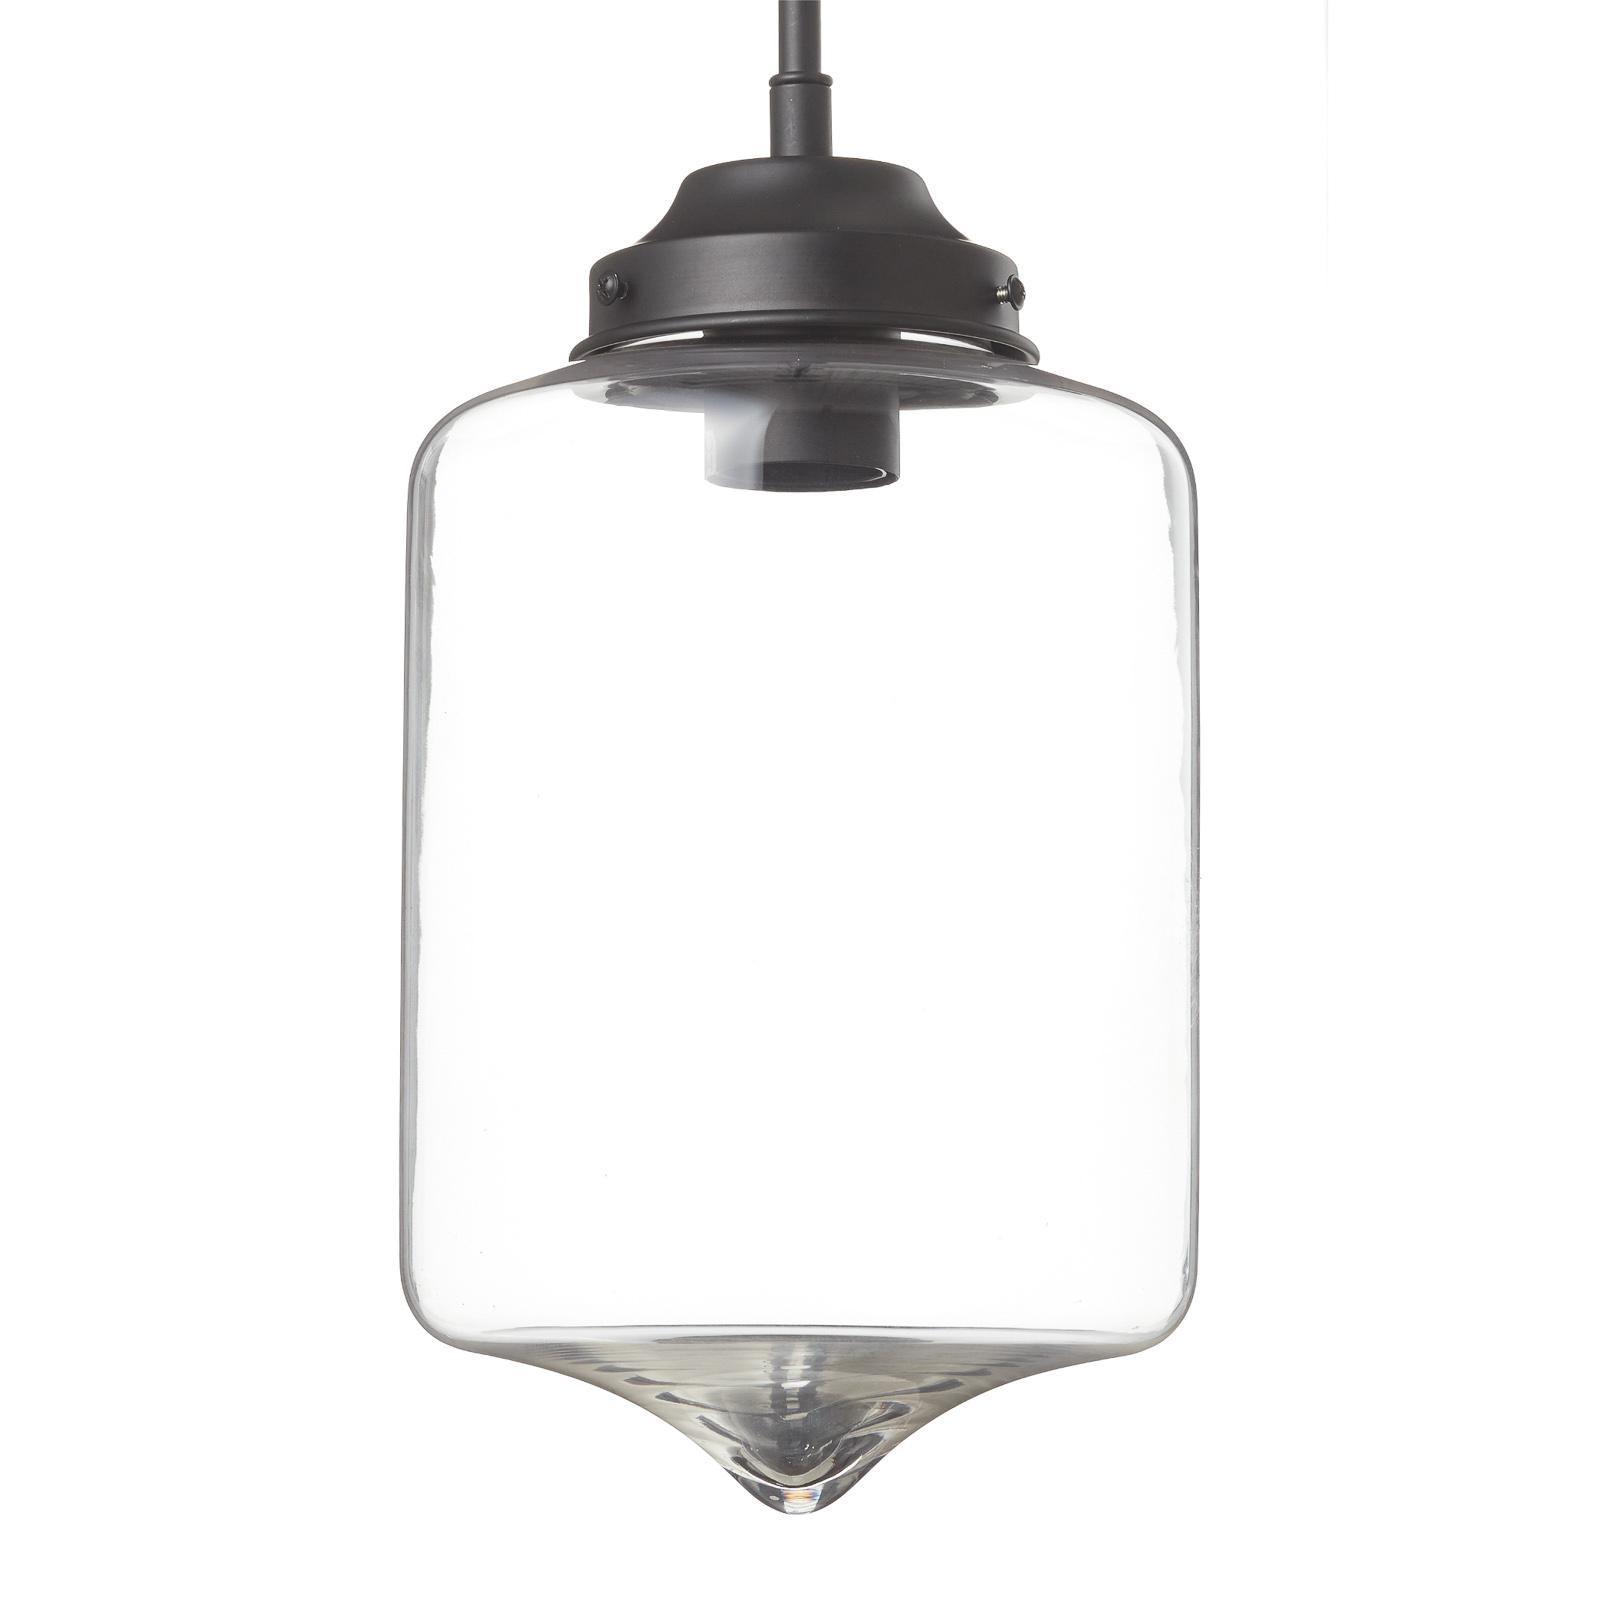 Lampa wisząca LA011 rura E27 szklany klosz